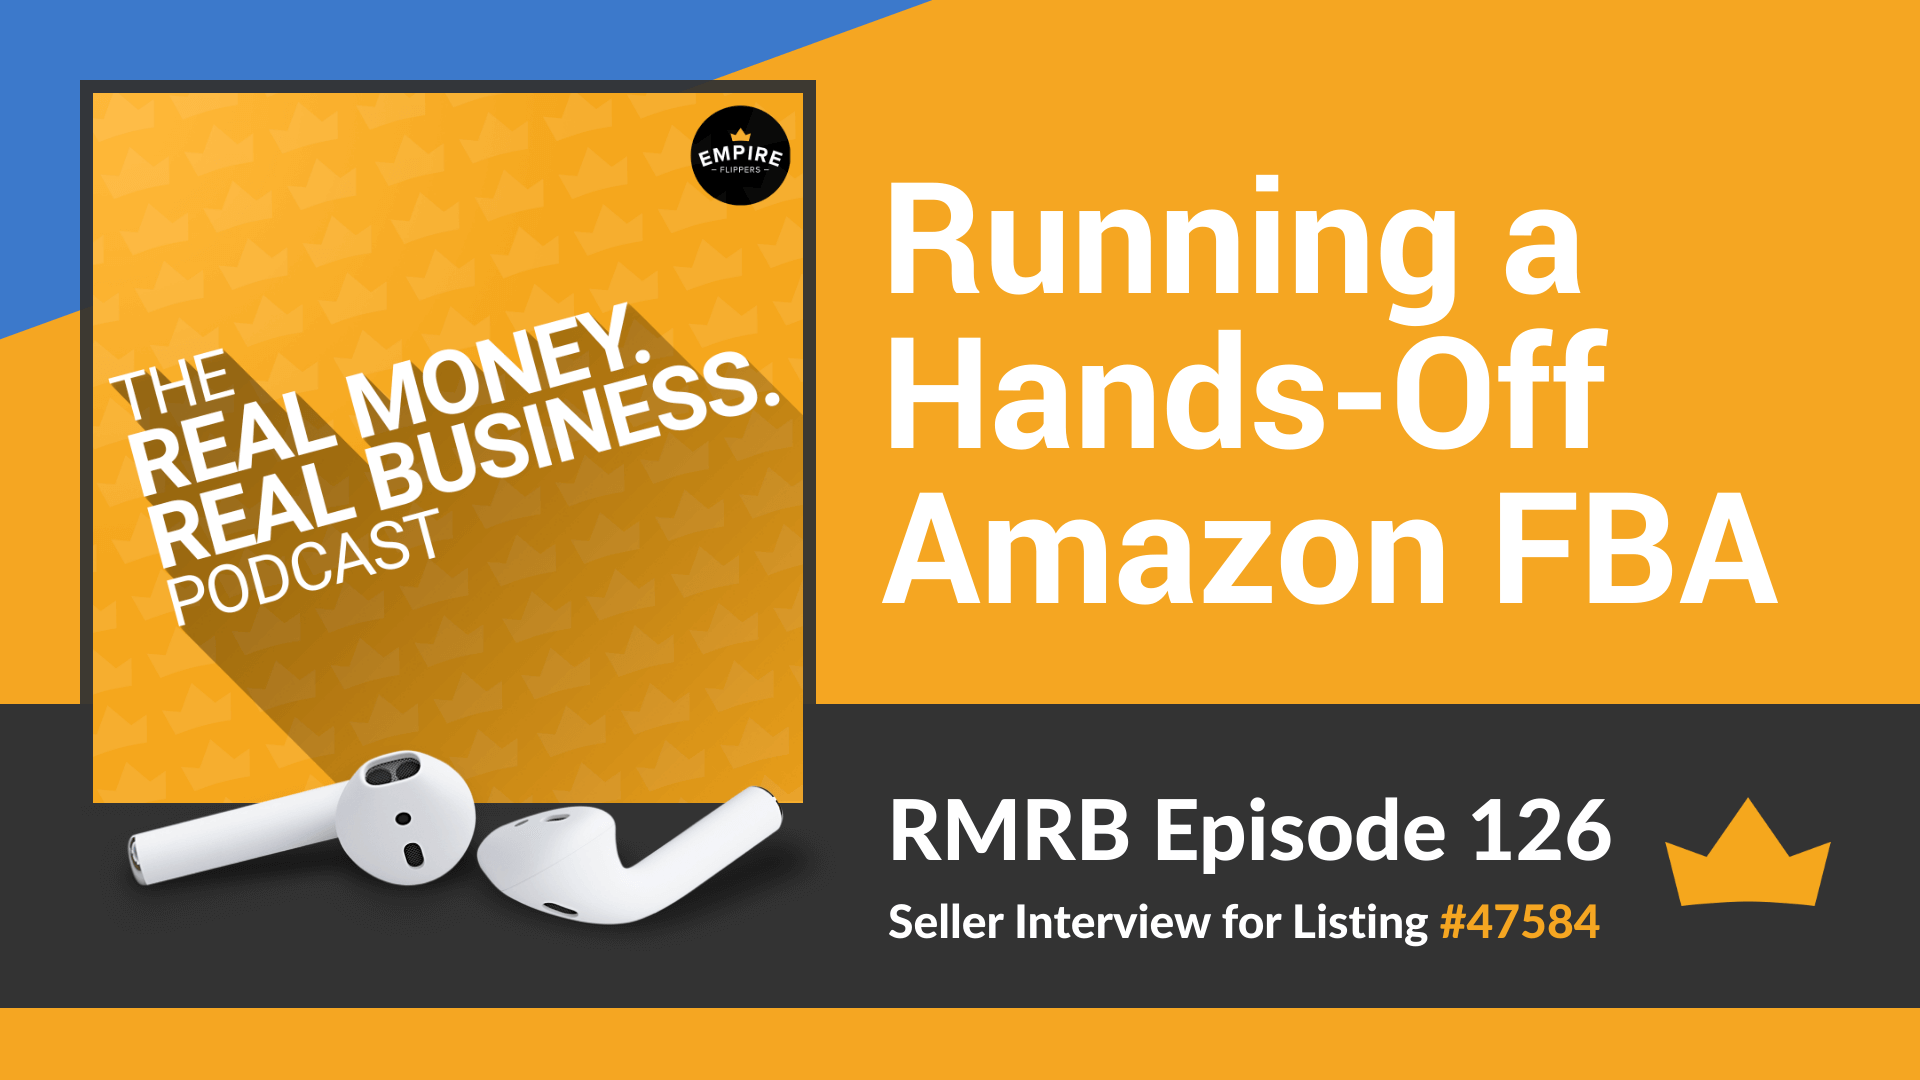 RMRB 126 - Running a Hands-Off Amazon FBA